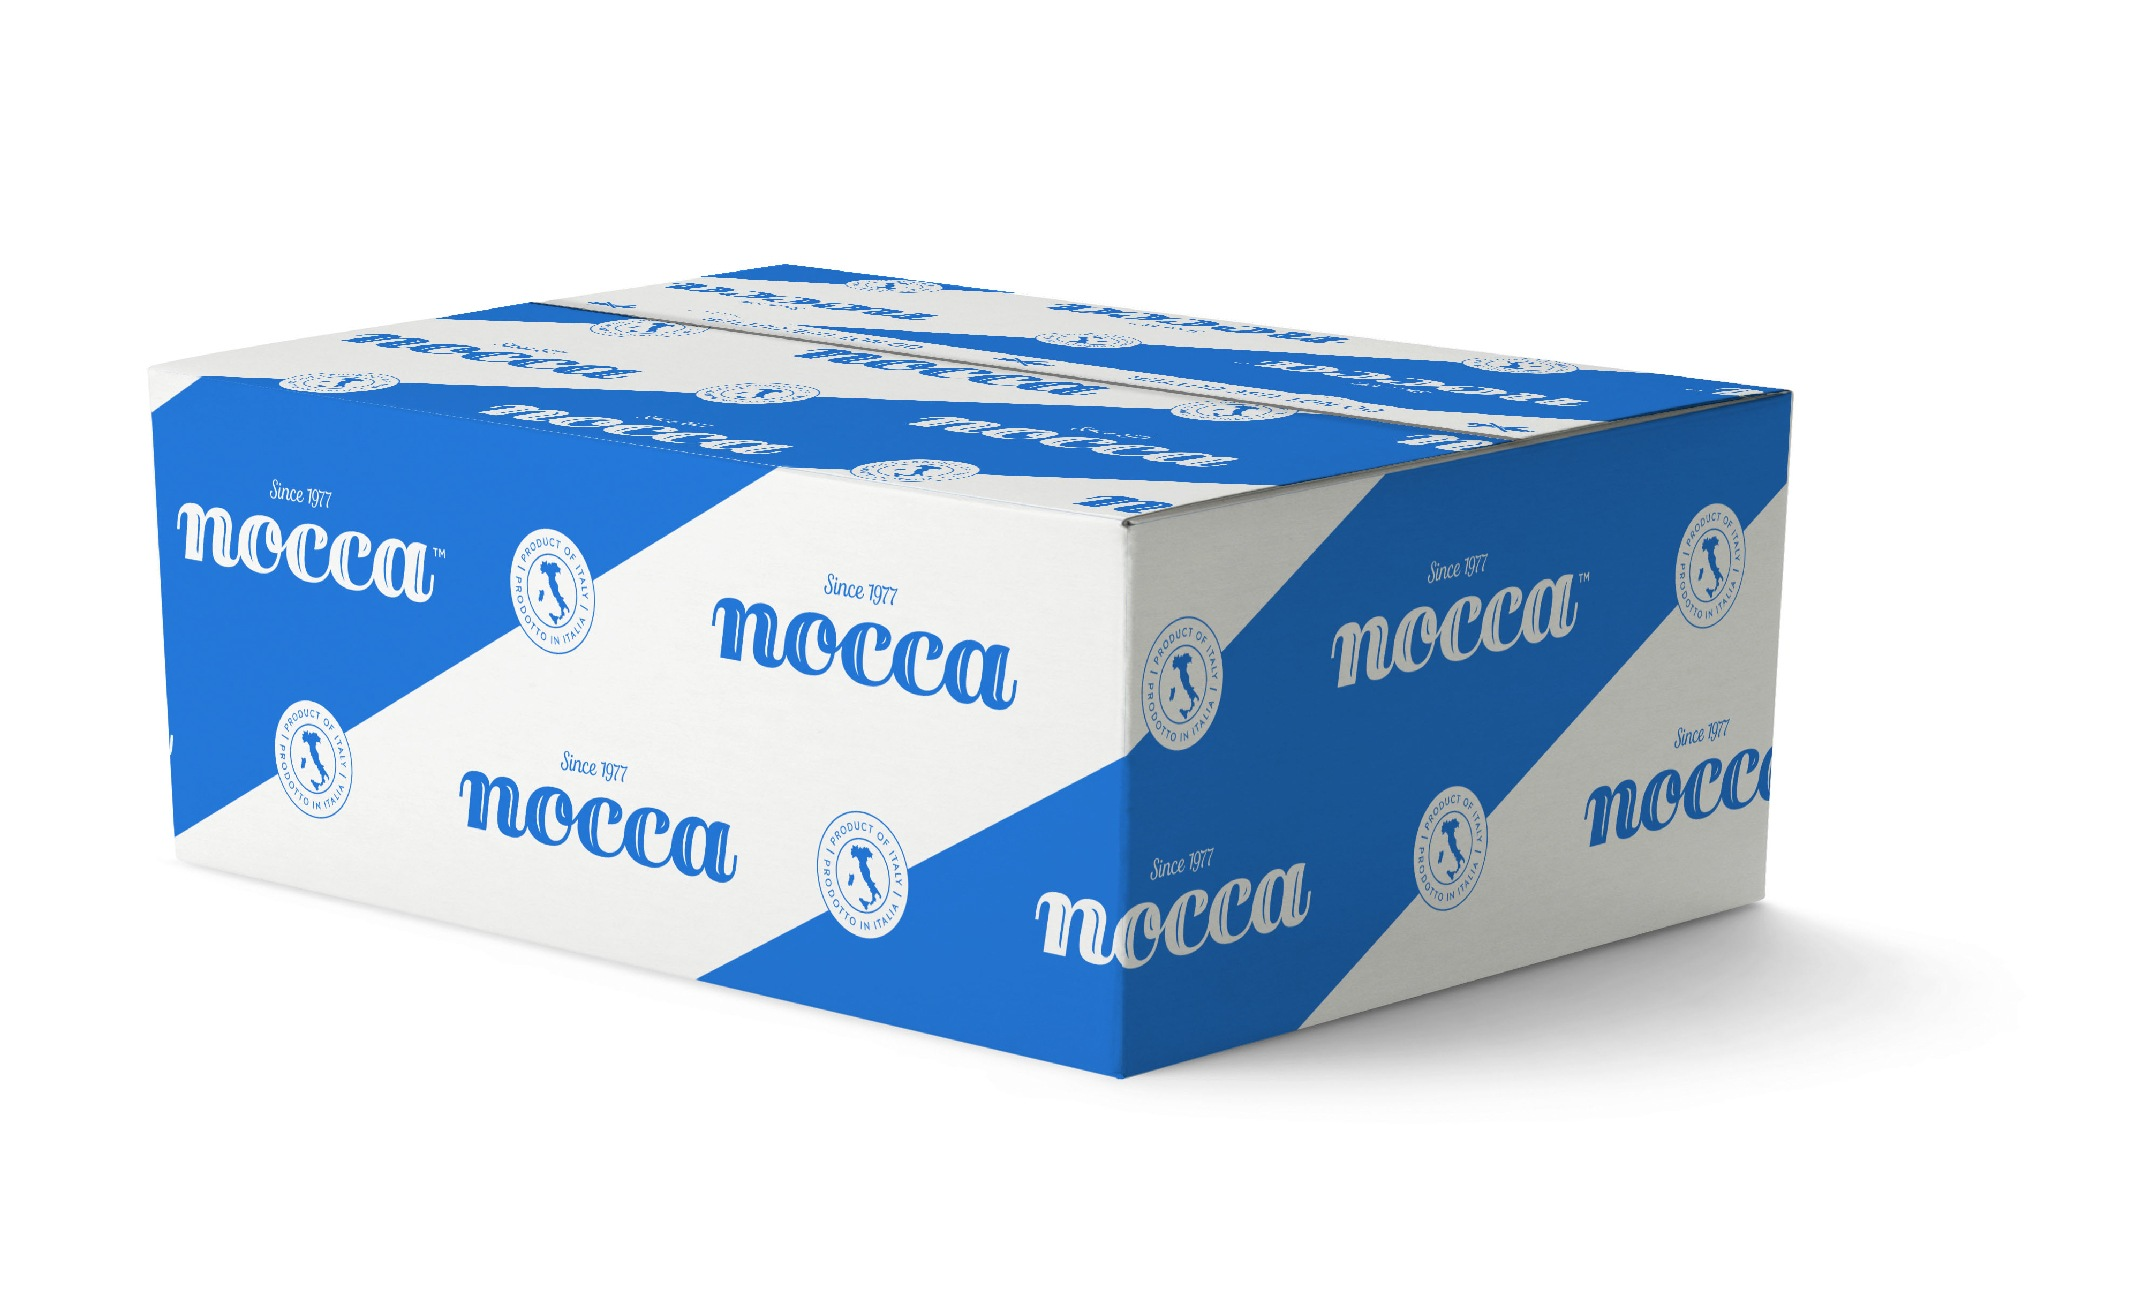 Nocca Pasta Brand Shipping Box